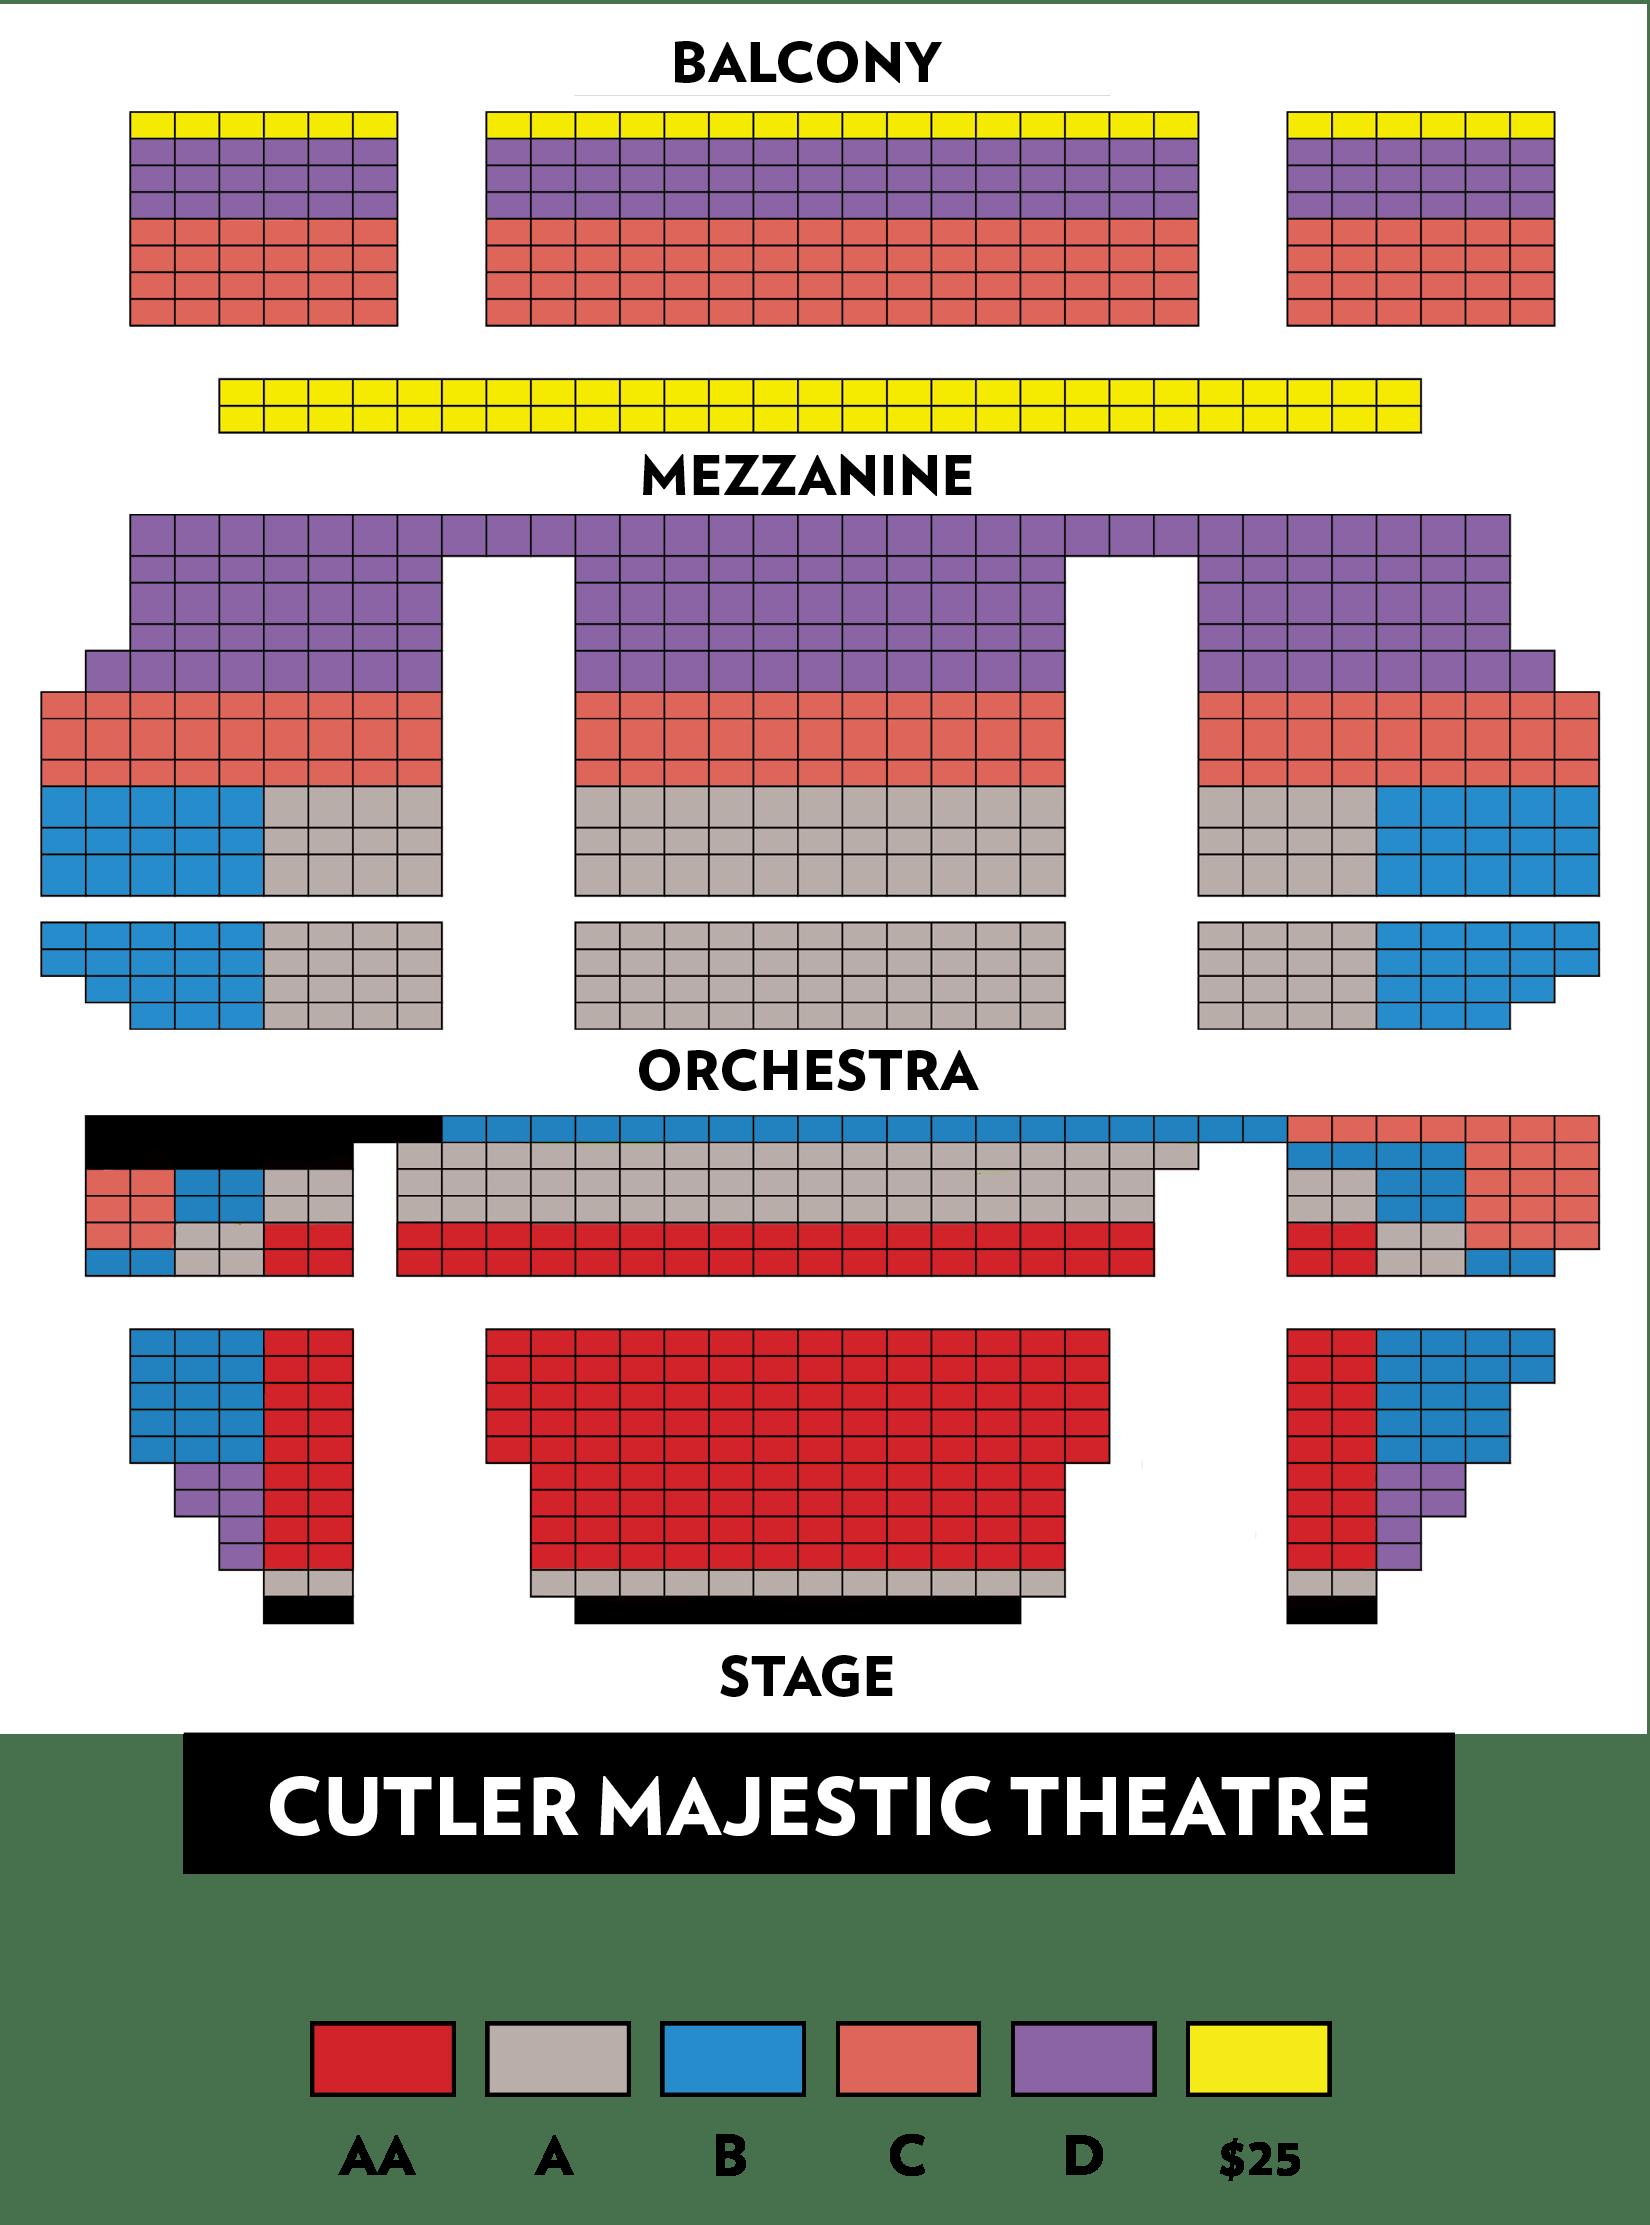 Boston lyric opera tosca also emerson cutler majestic theatre tickets schedule seating rh goldstar